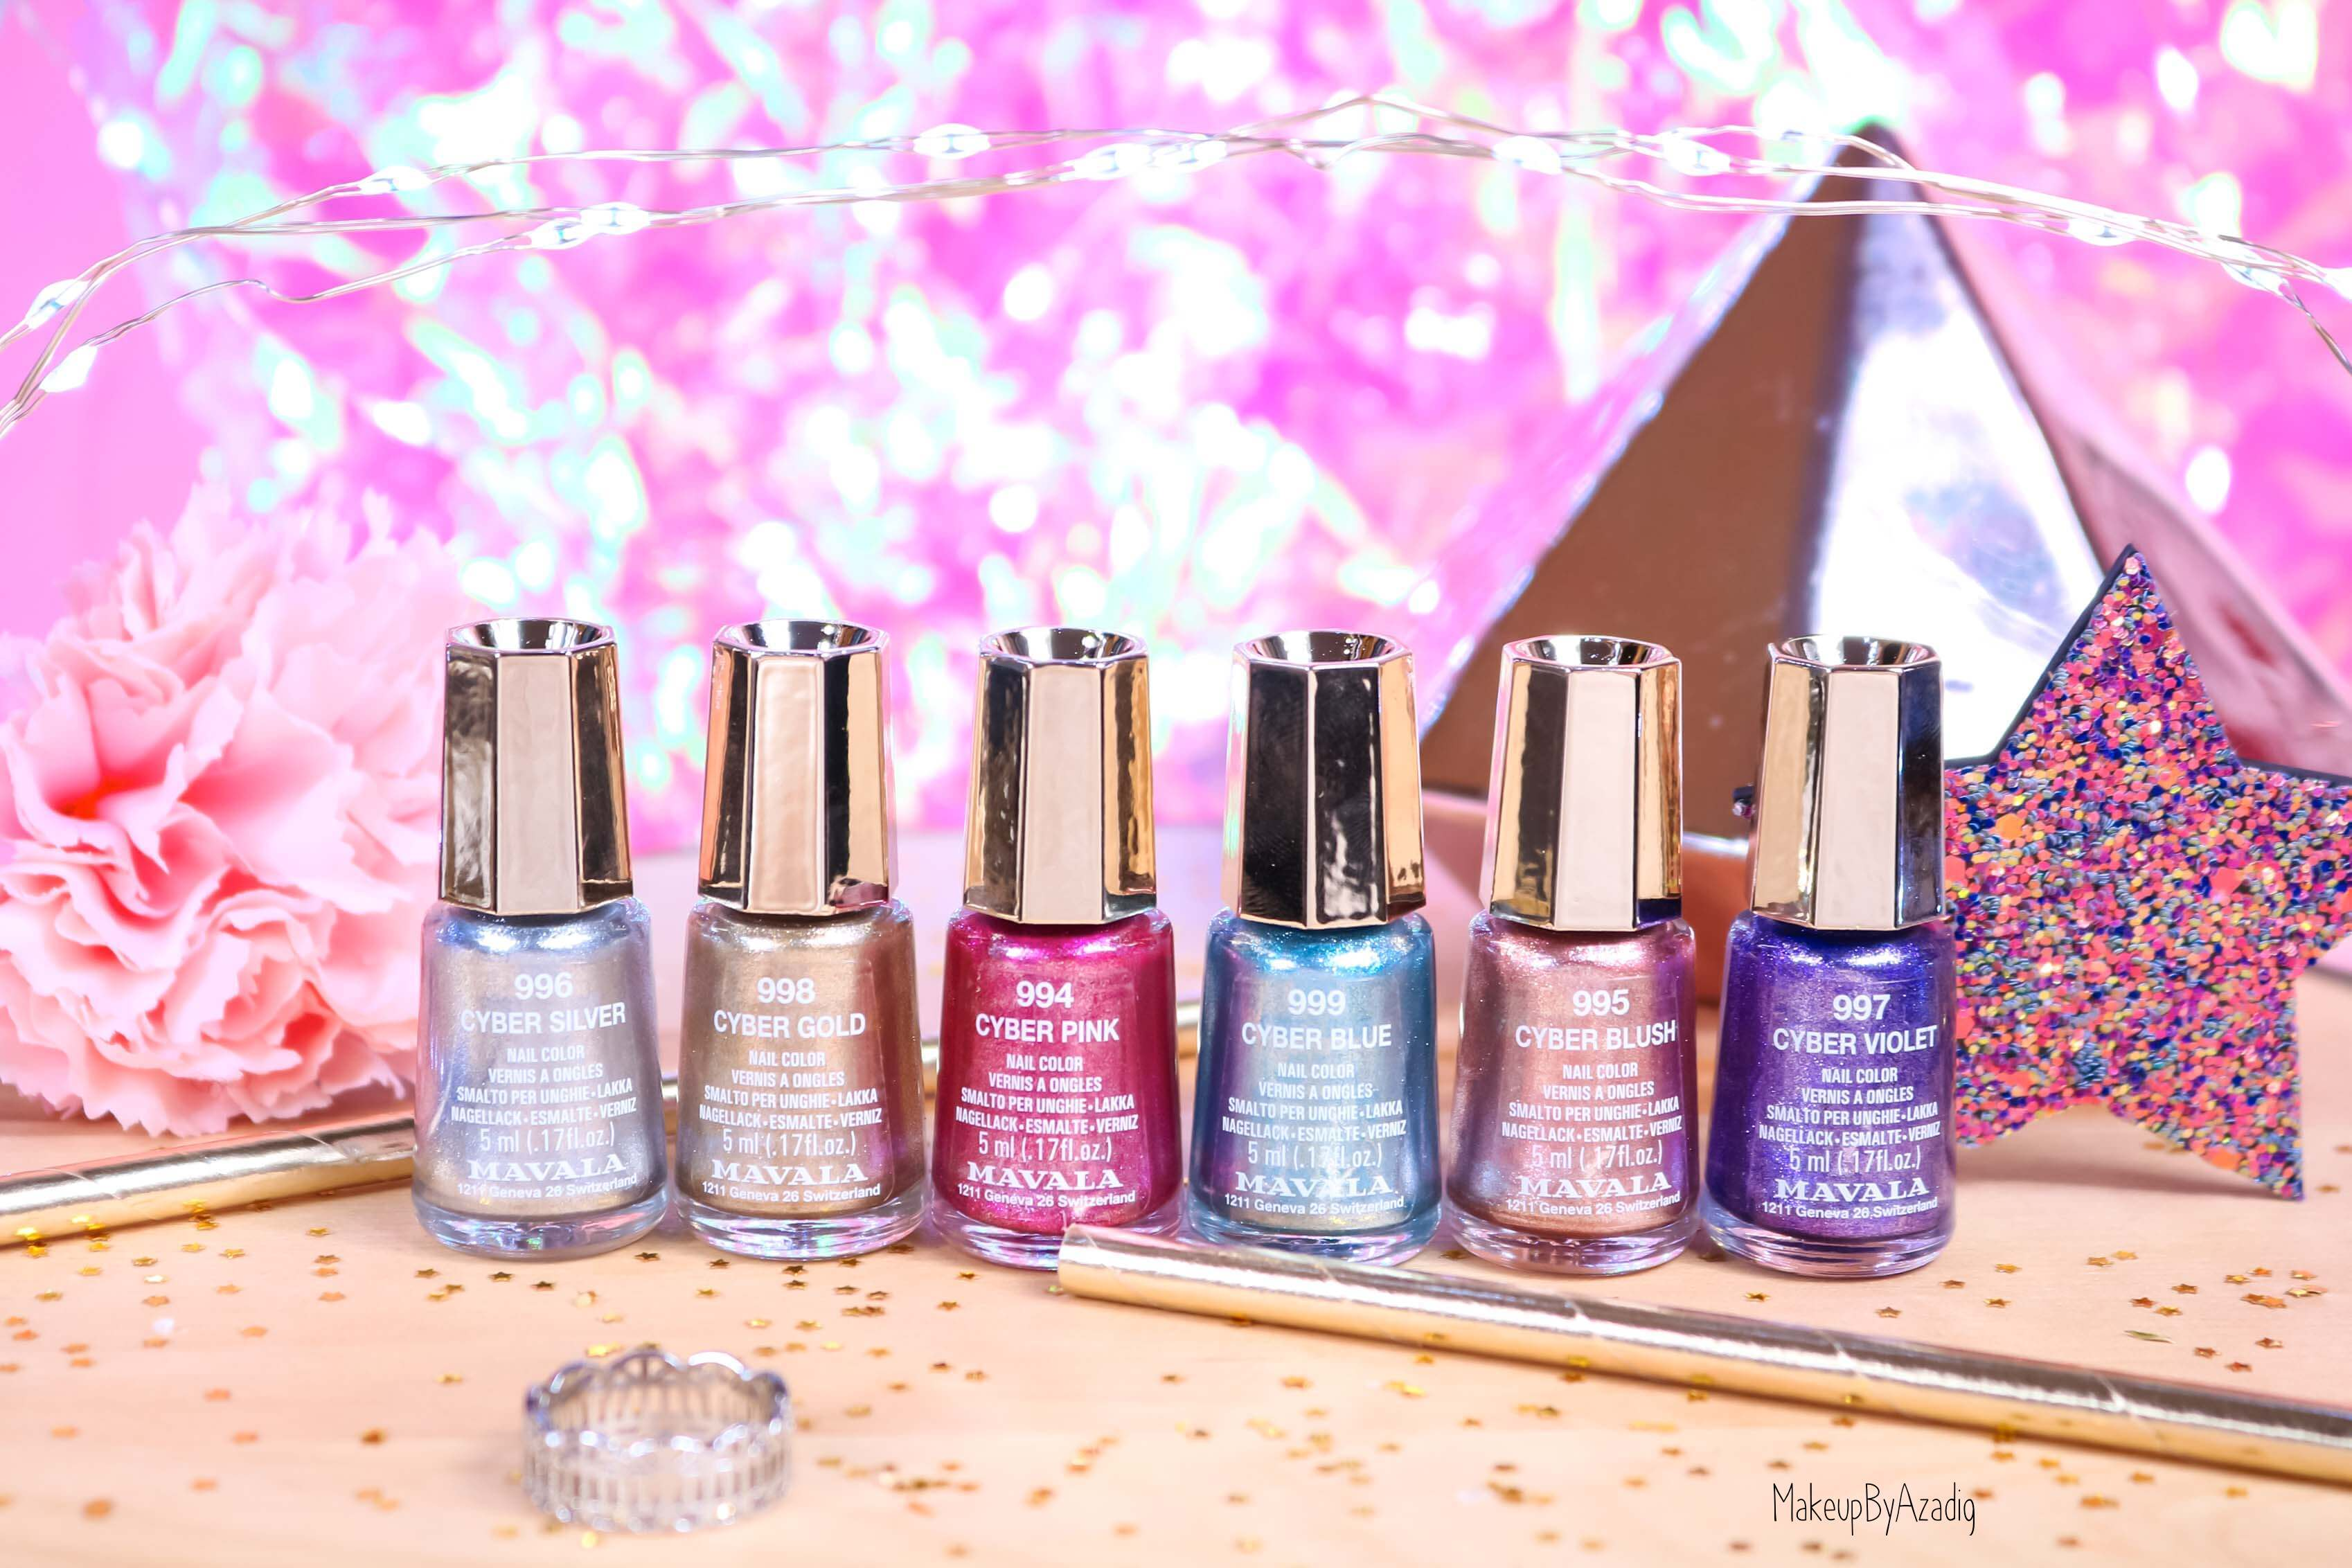 revue-collection-vernis-nails-cyber-chic-fetes-noel-metallique-gold-silver-makeupbyazadig-swatch-avis-prix-colors